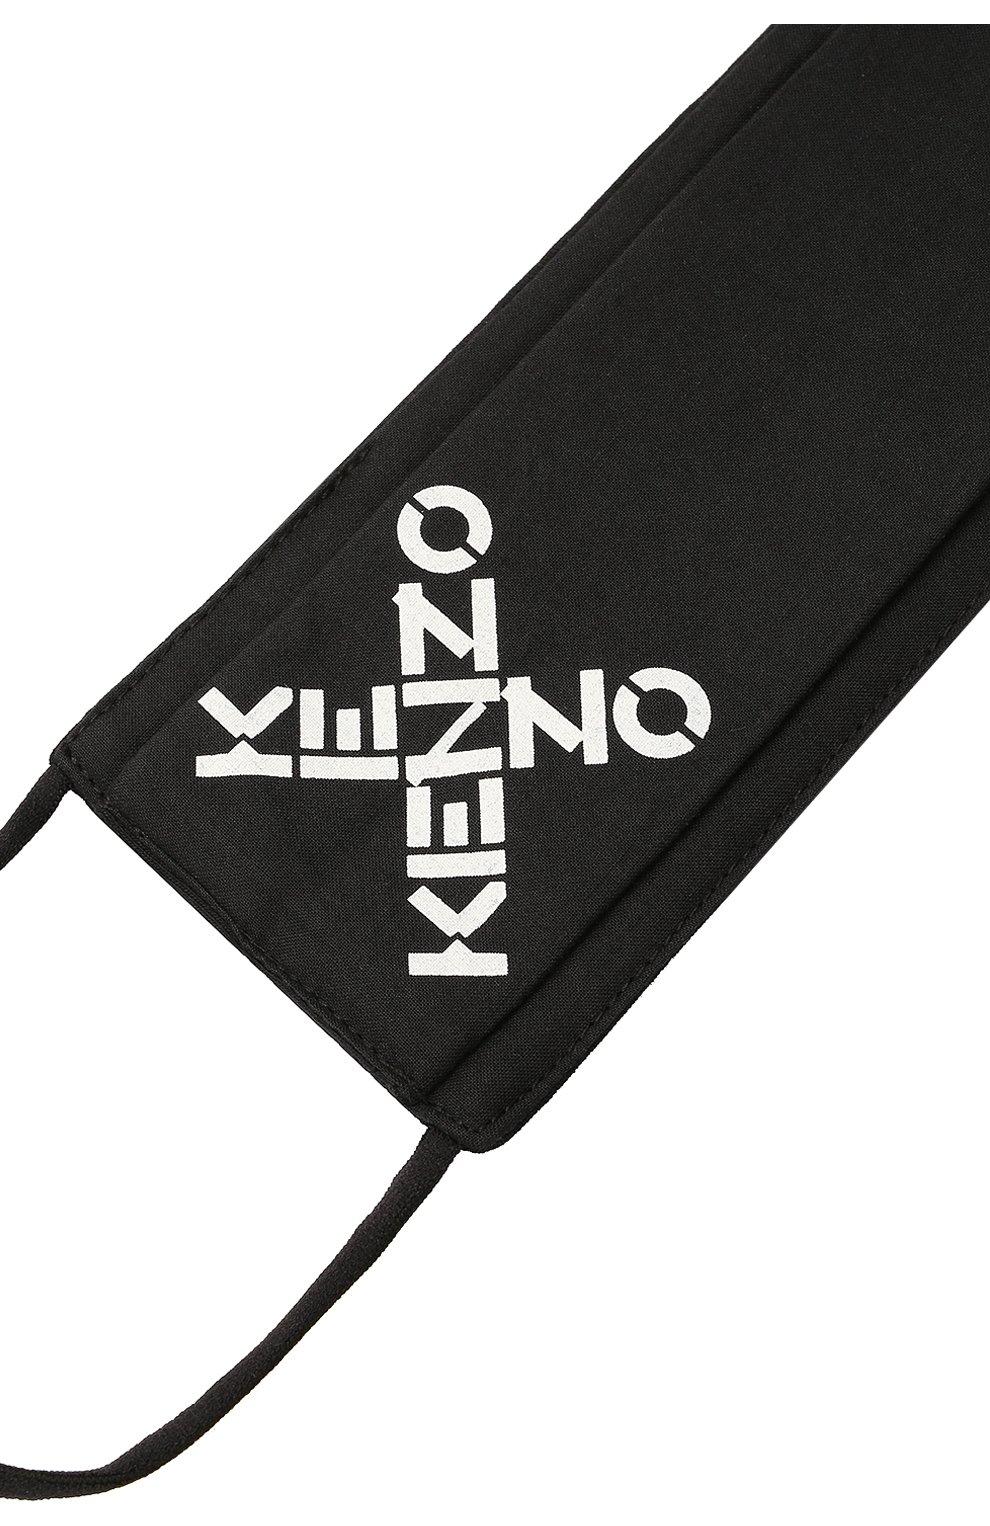 Мужская набор из трех масок для лица kenzo sport KENZO разноцветного цвета, арт. FA68MK221SCB | Фото 2 (Материал: Текстиль; Мужское Кросс-КТ: Маска)